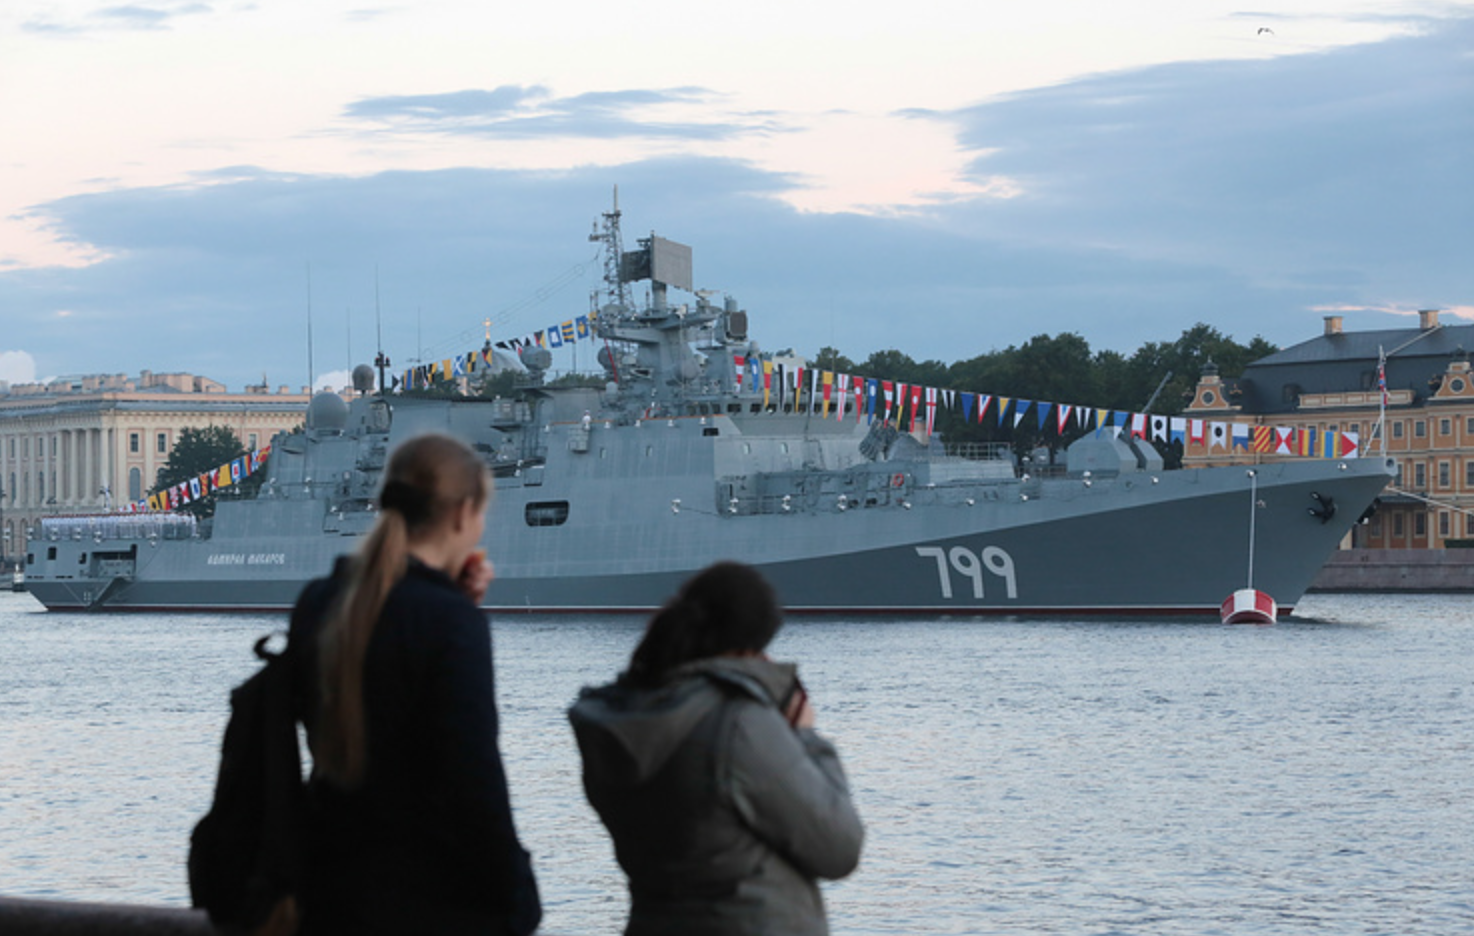 Perkuat Armada Laut Hitam, Kemhan Rusia Terima Fregat Admiral Makarov